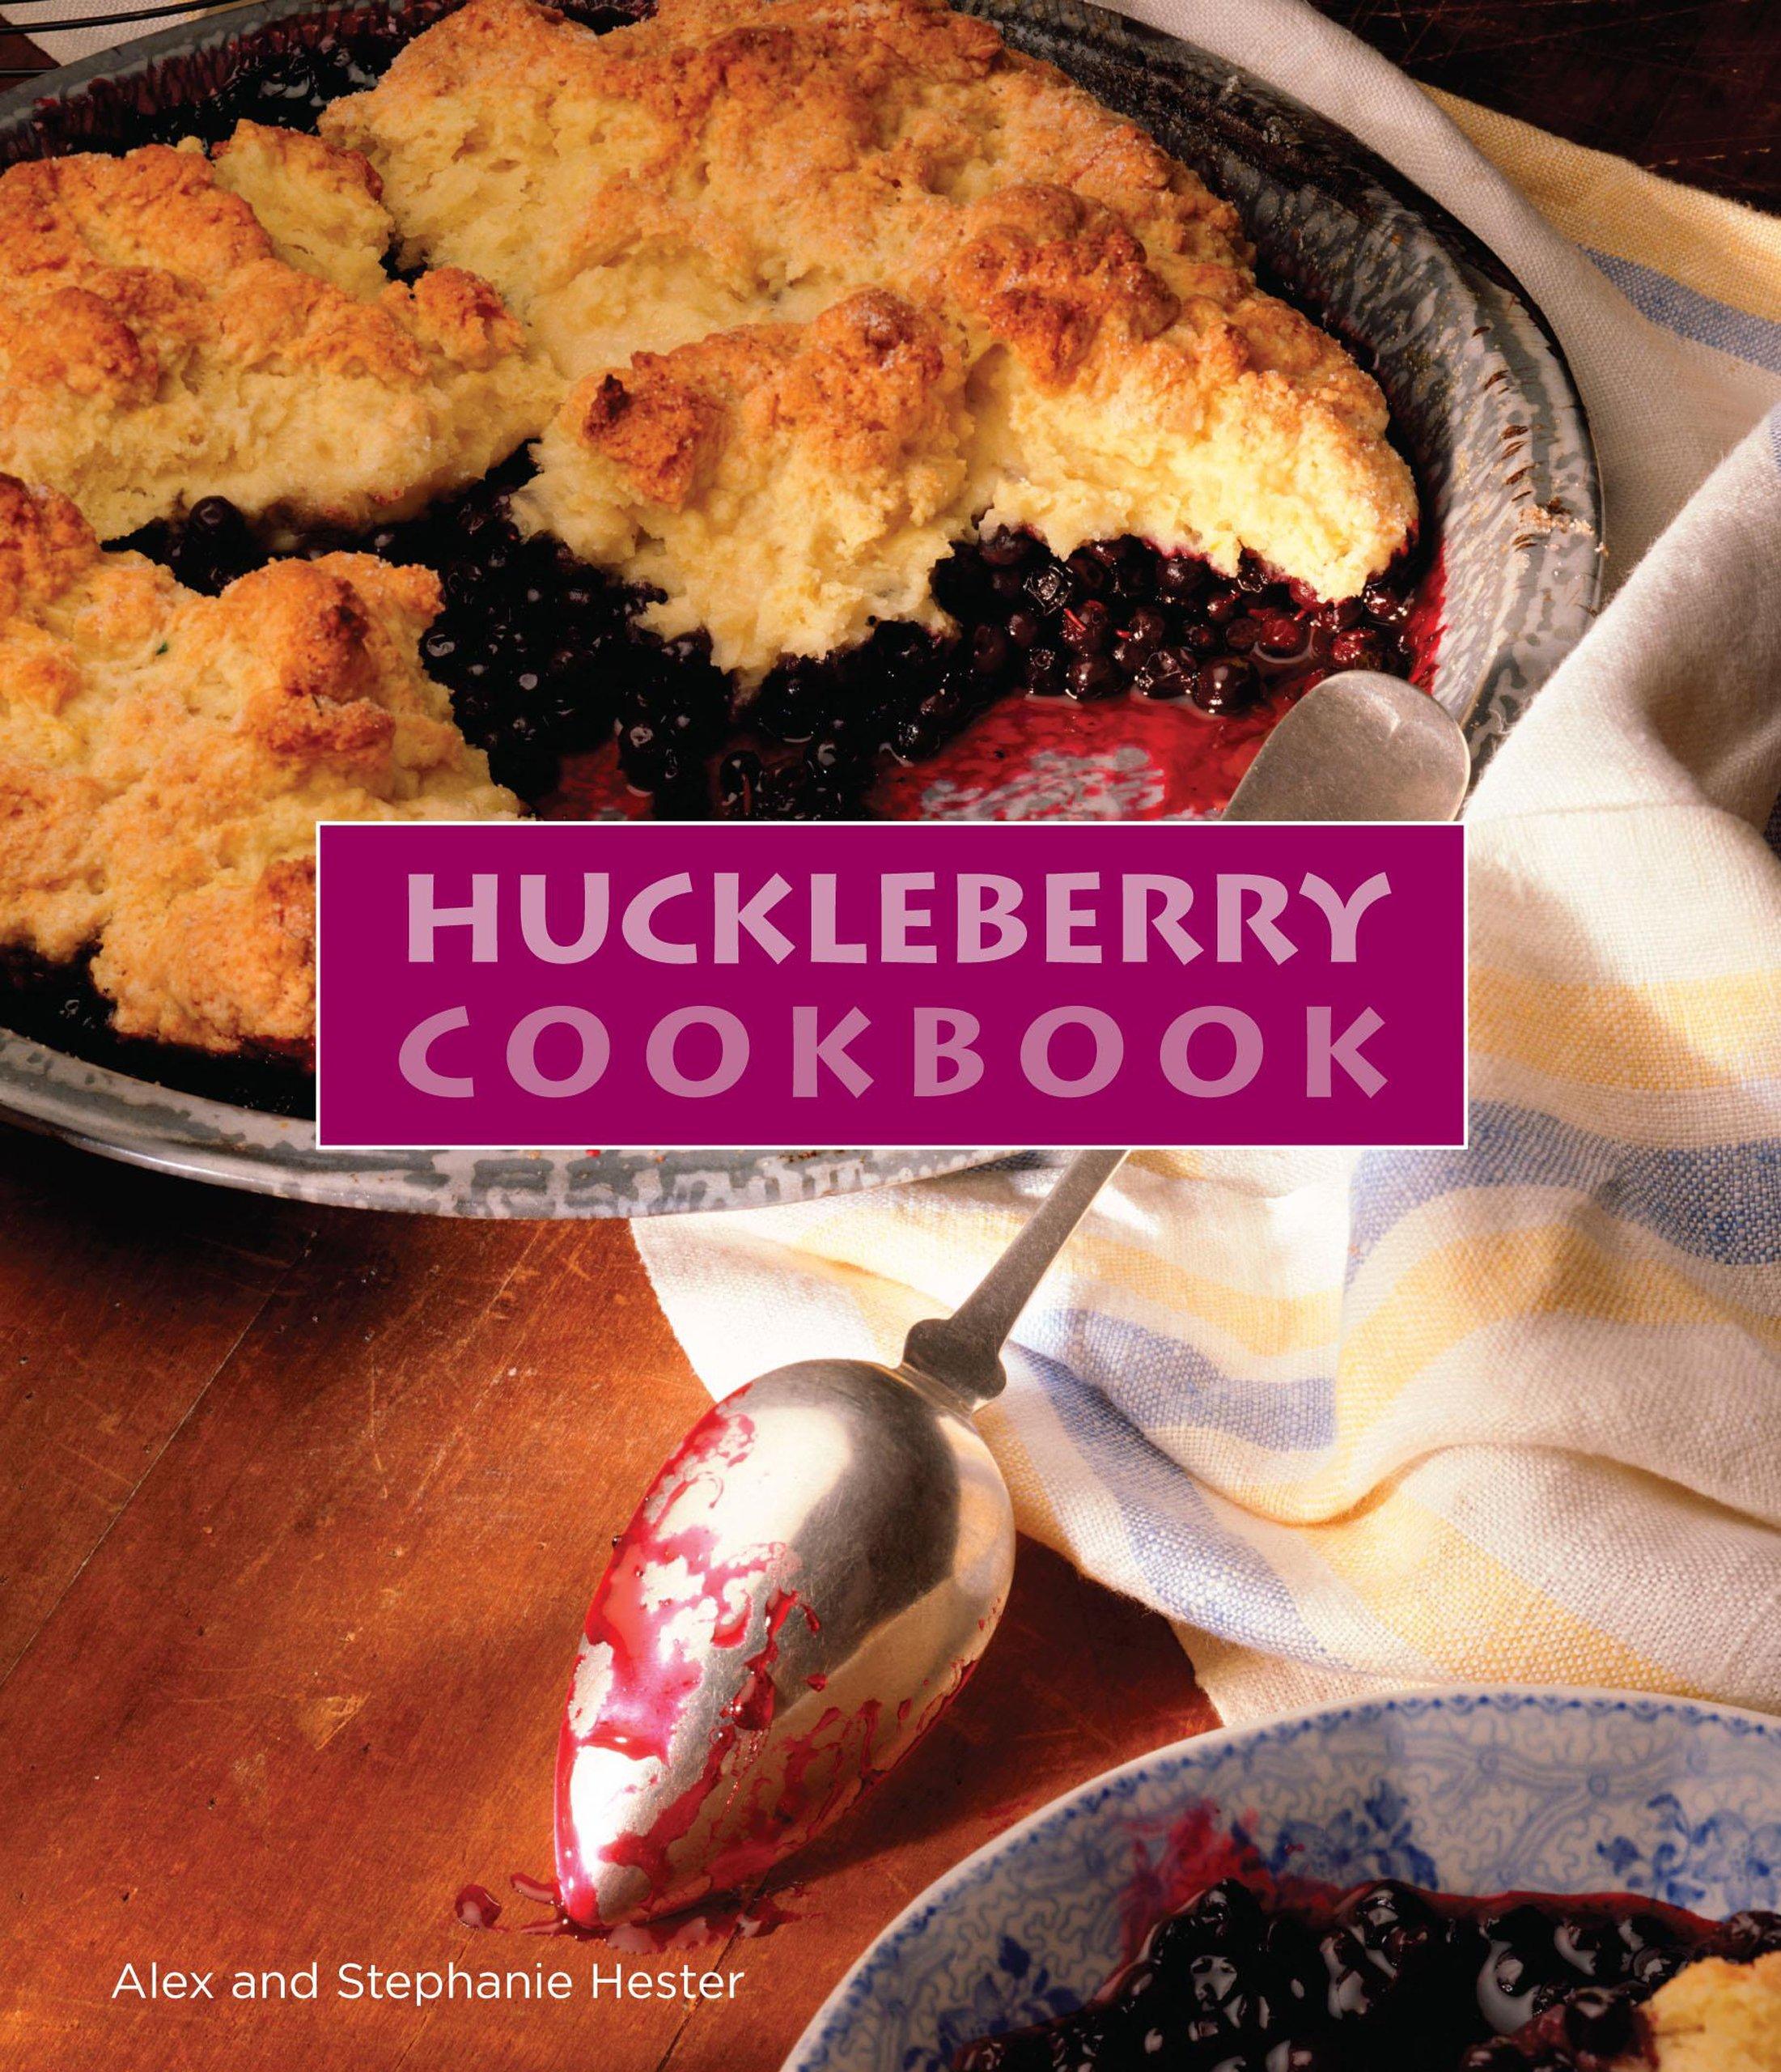 Huckleberry Cookbook ebook